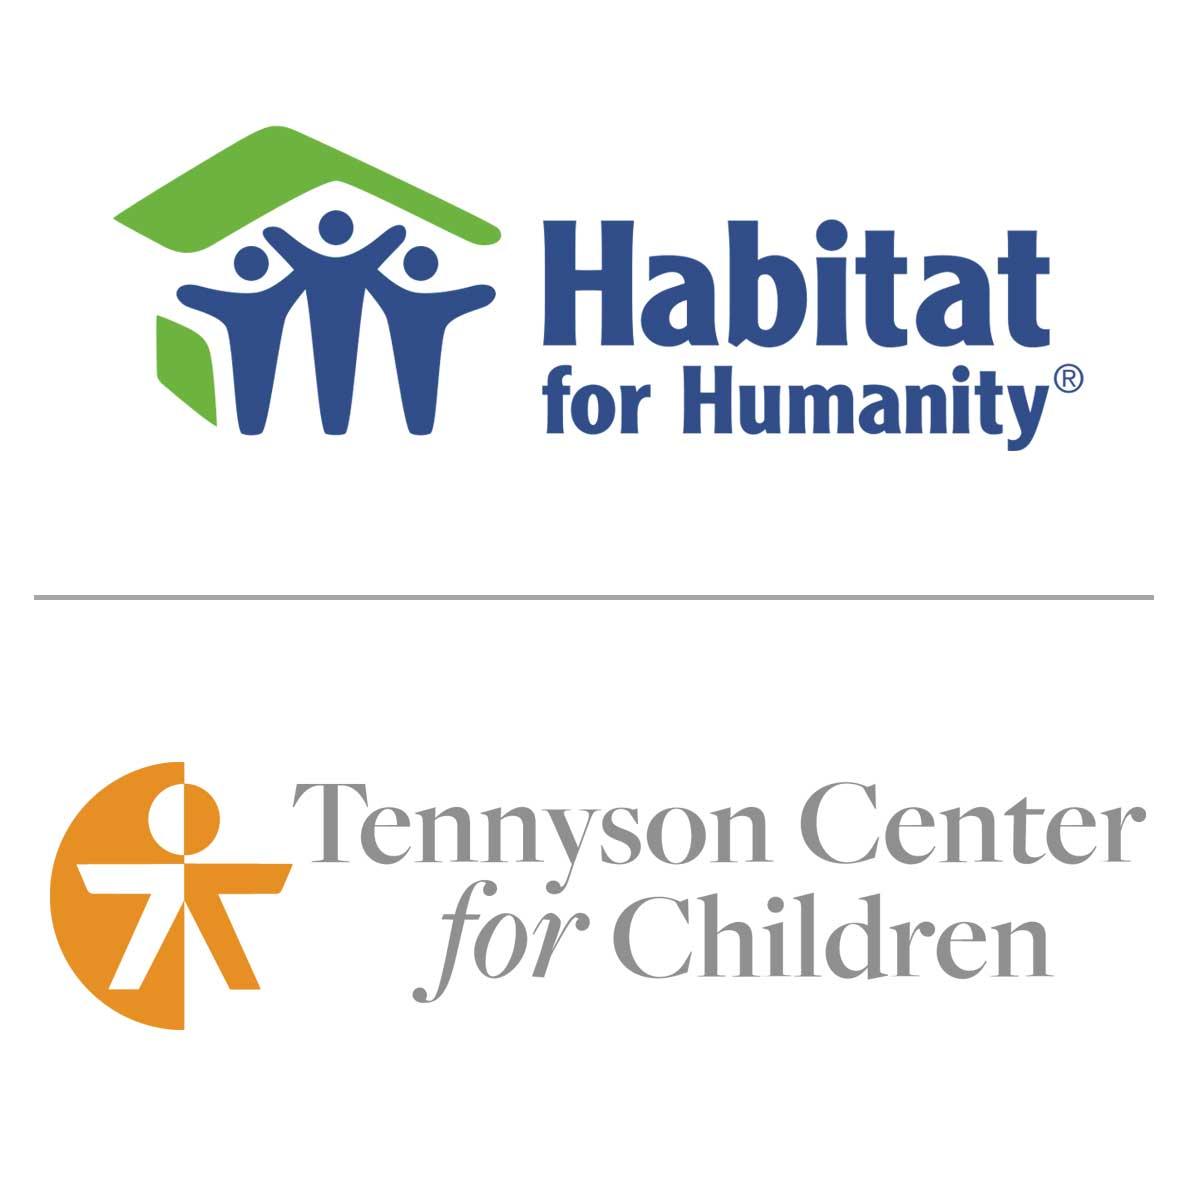 habitat-and-tennyson.jpg